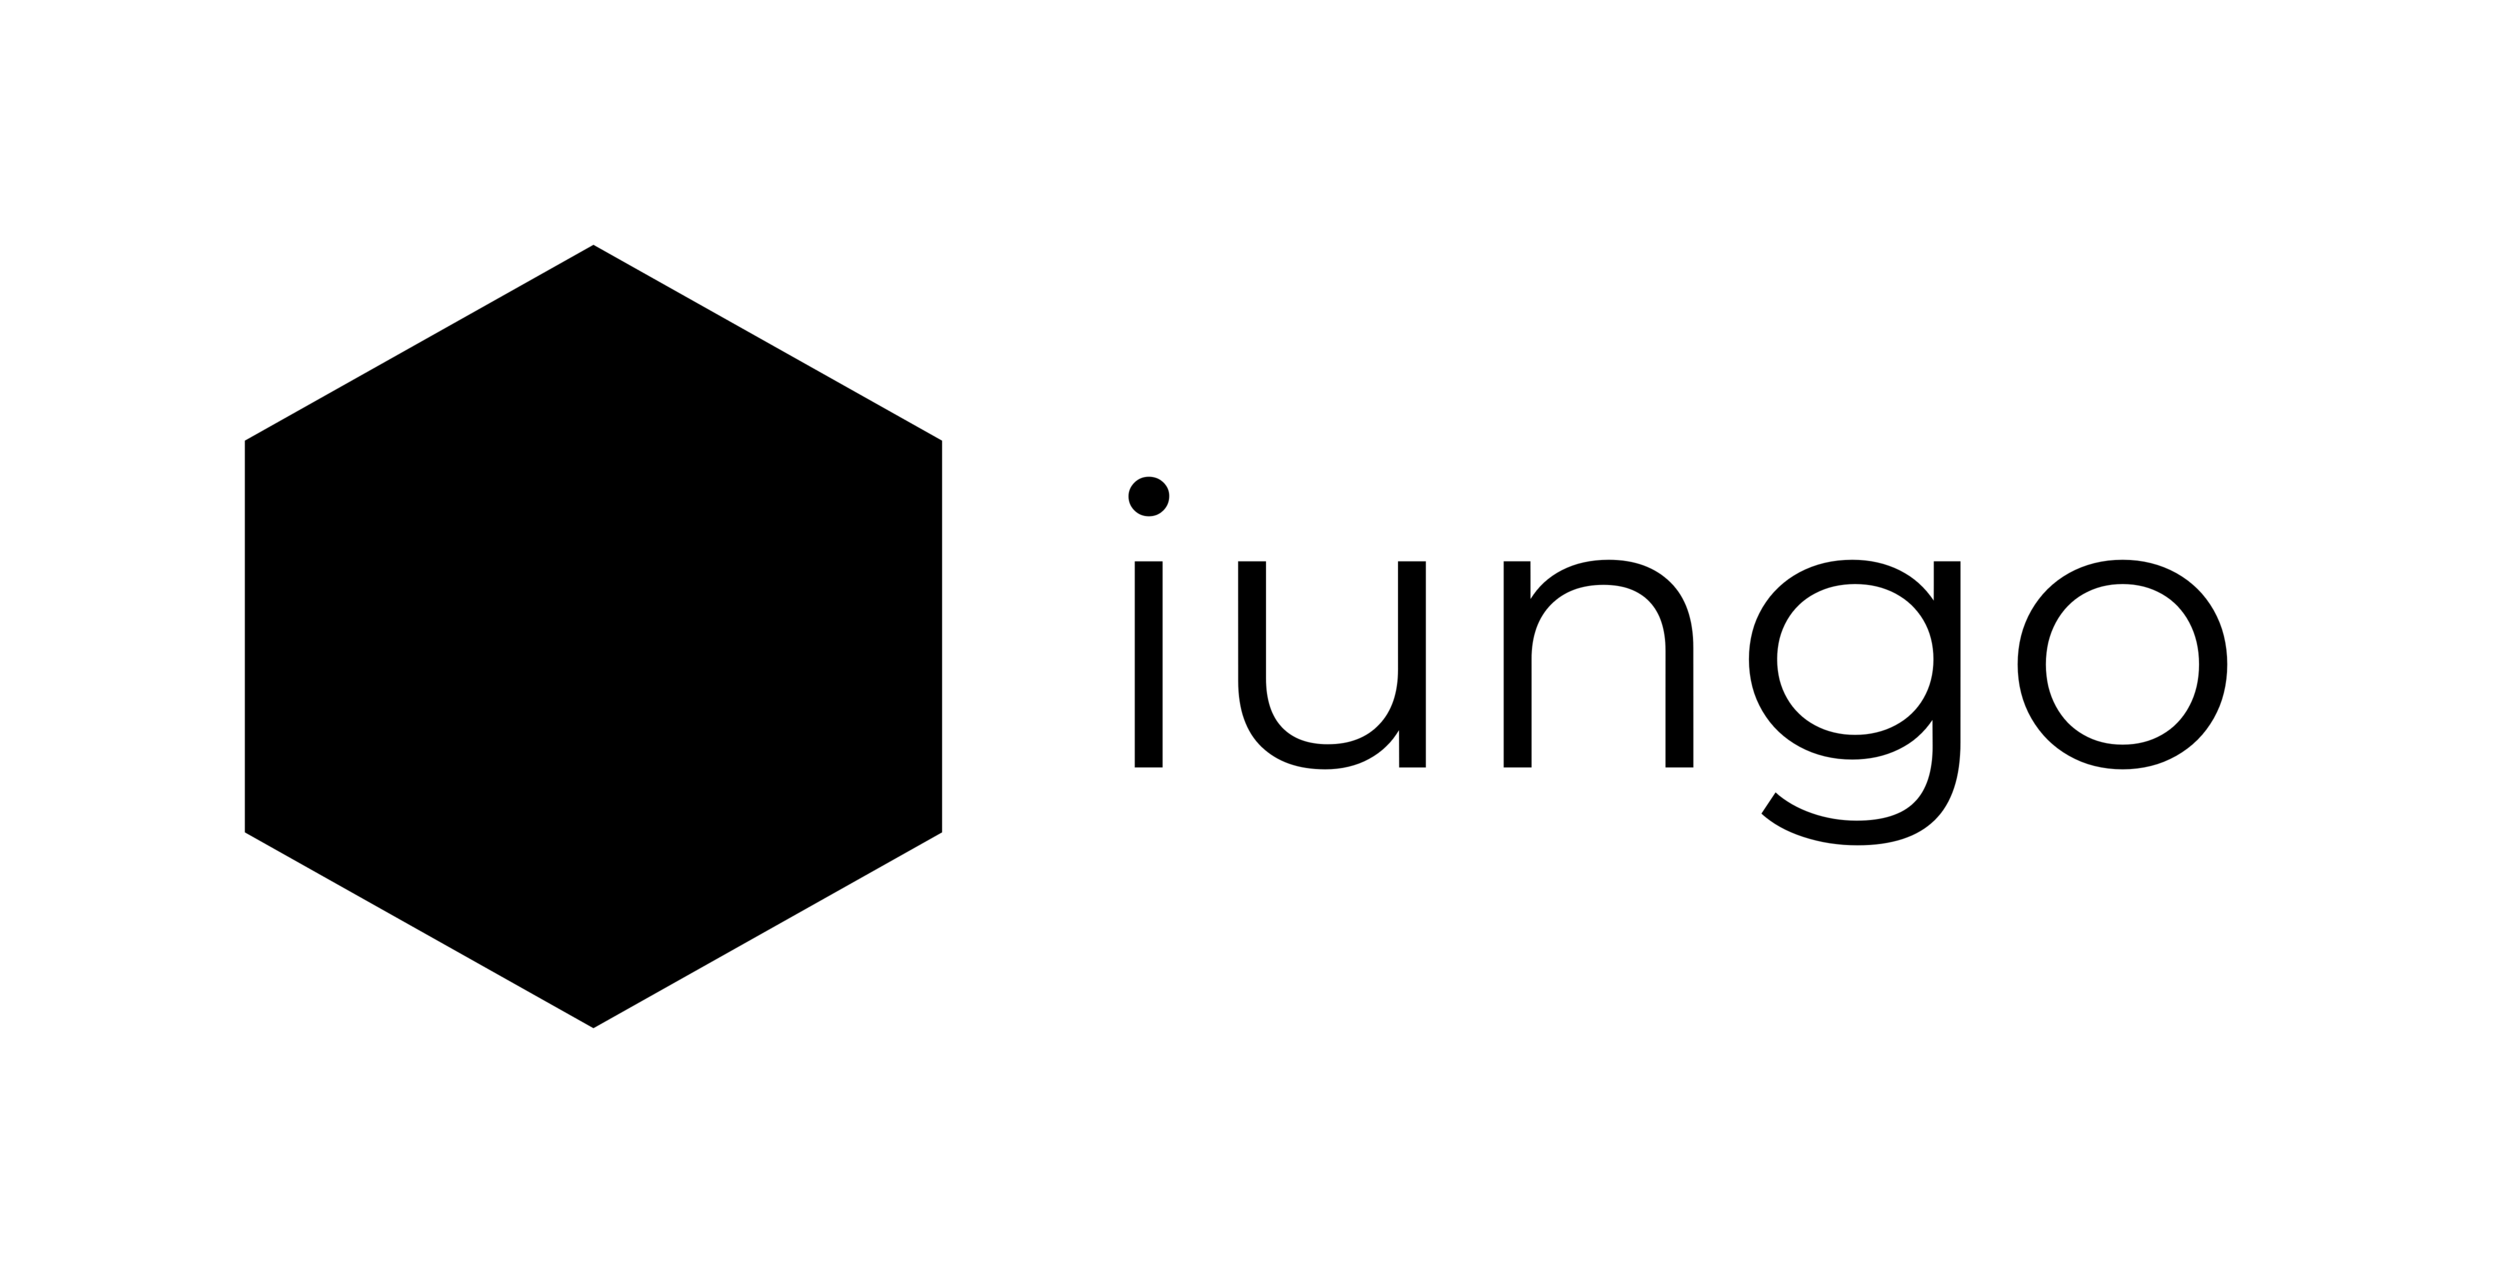 iungo-logo-black.png